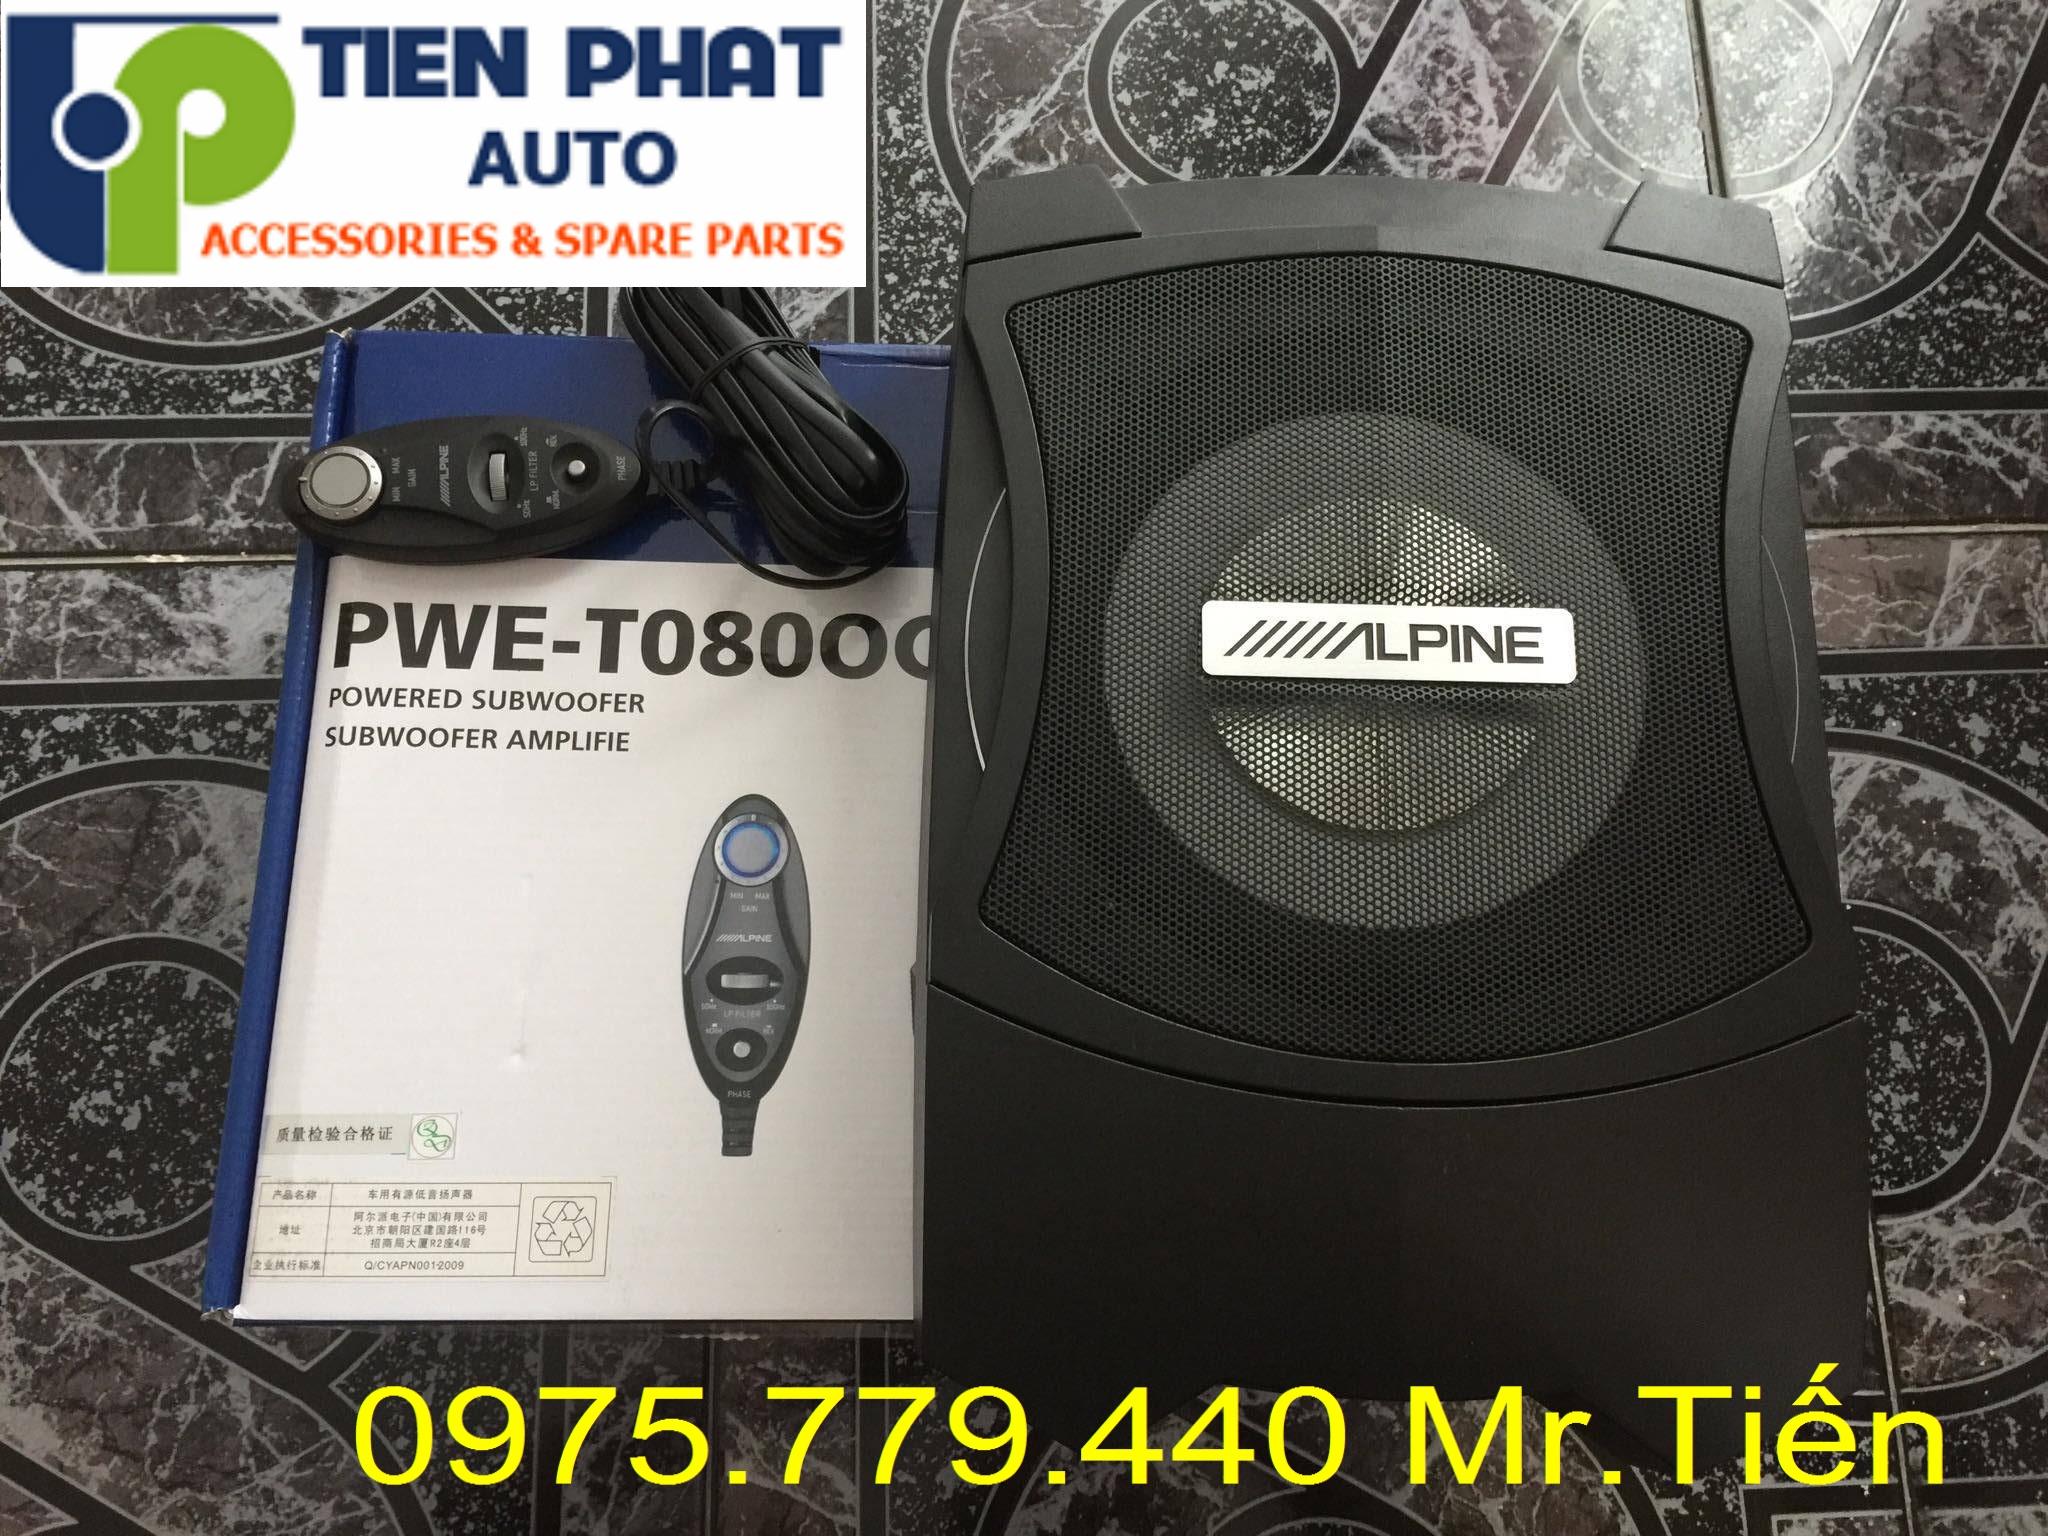 Lắp Loa sub Alpine PWE-T0800C cho Mazda BT50 Lắp Đặt Tận Nơi